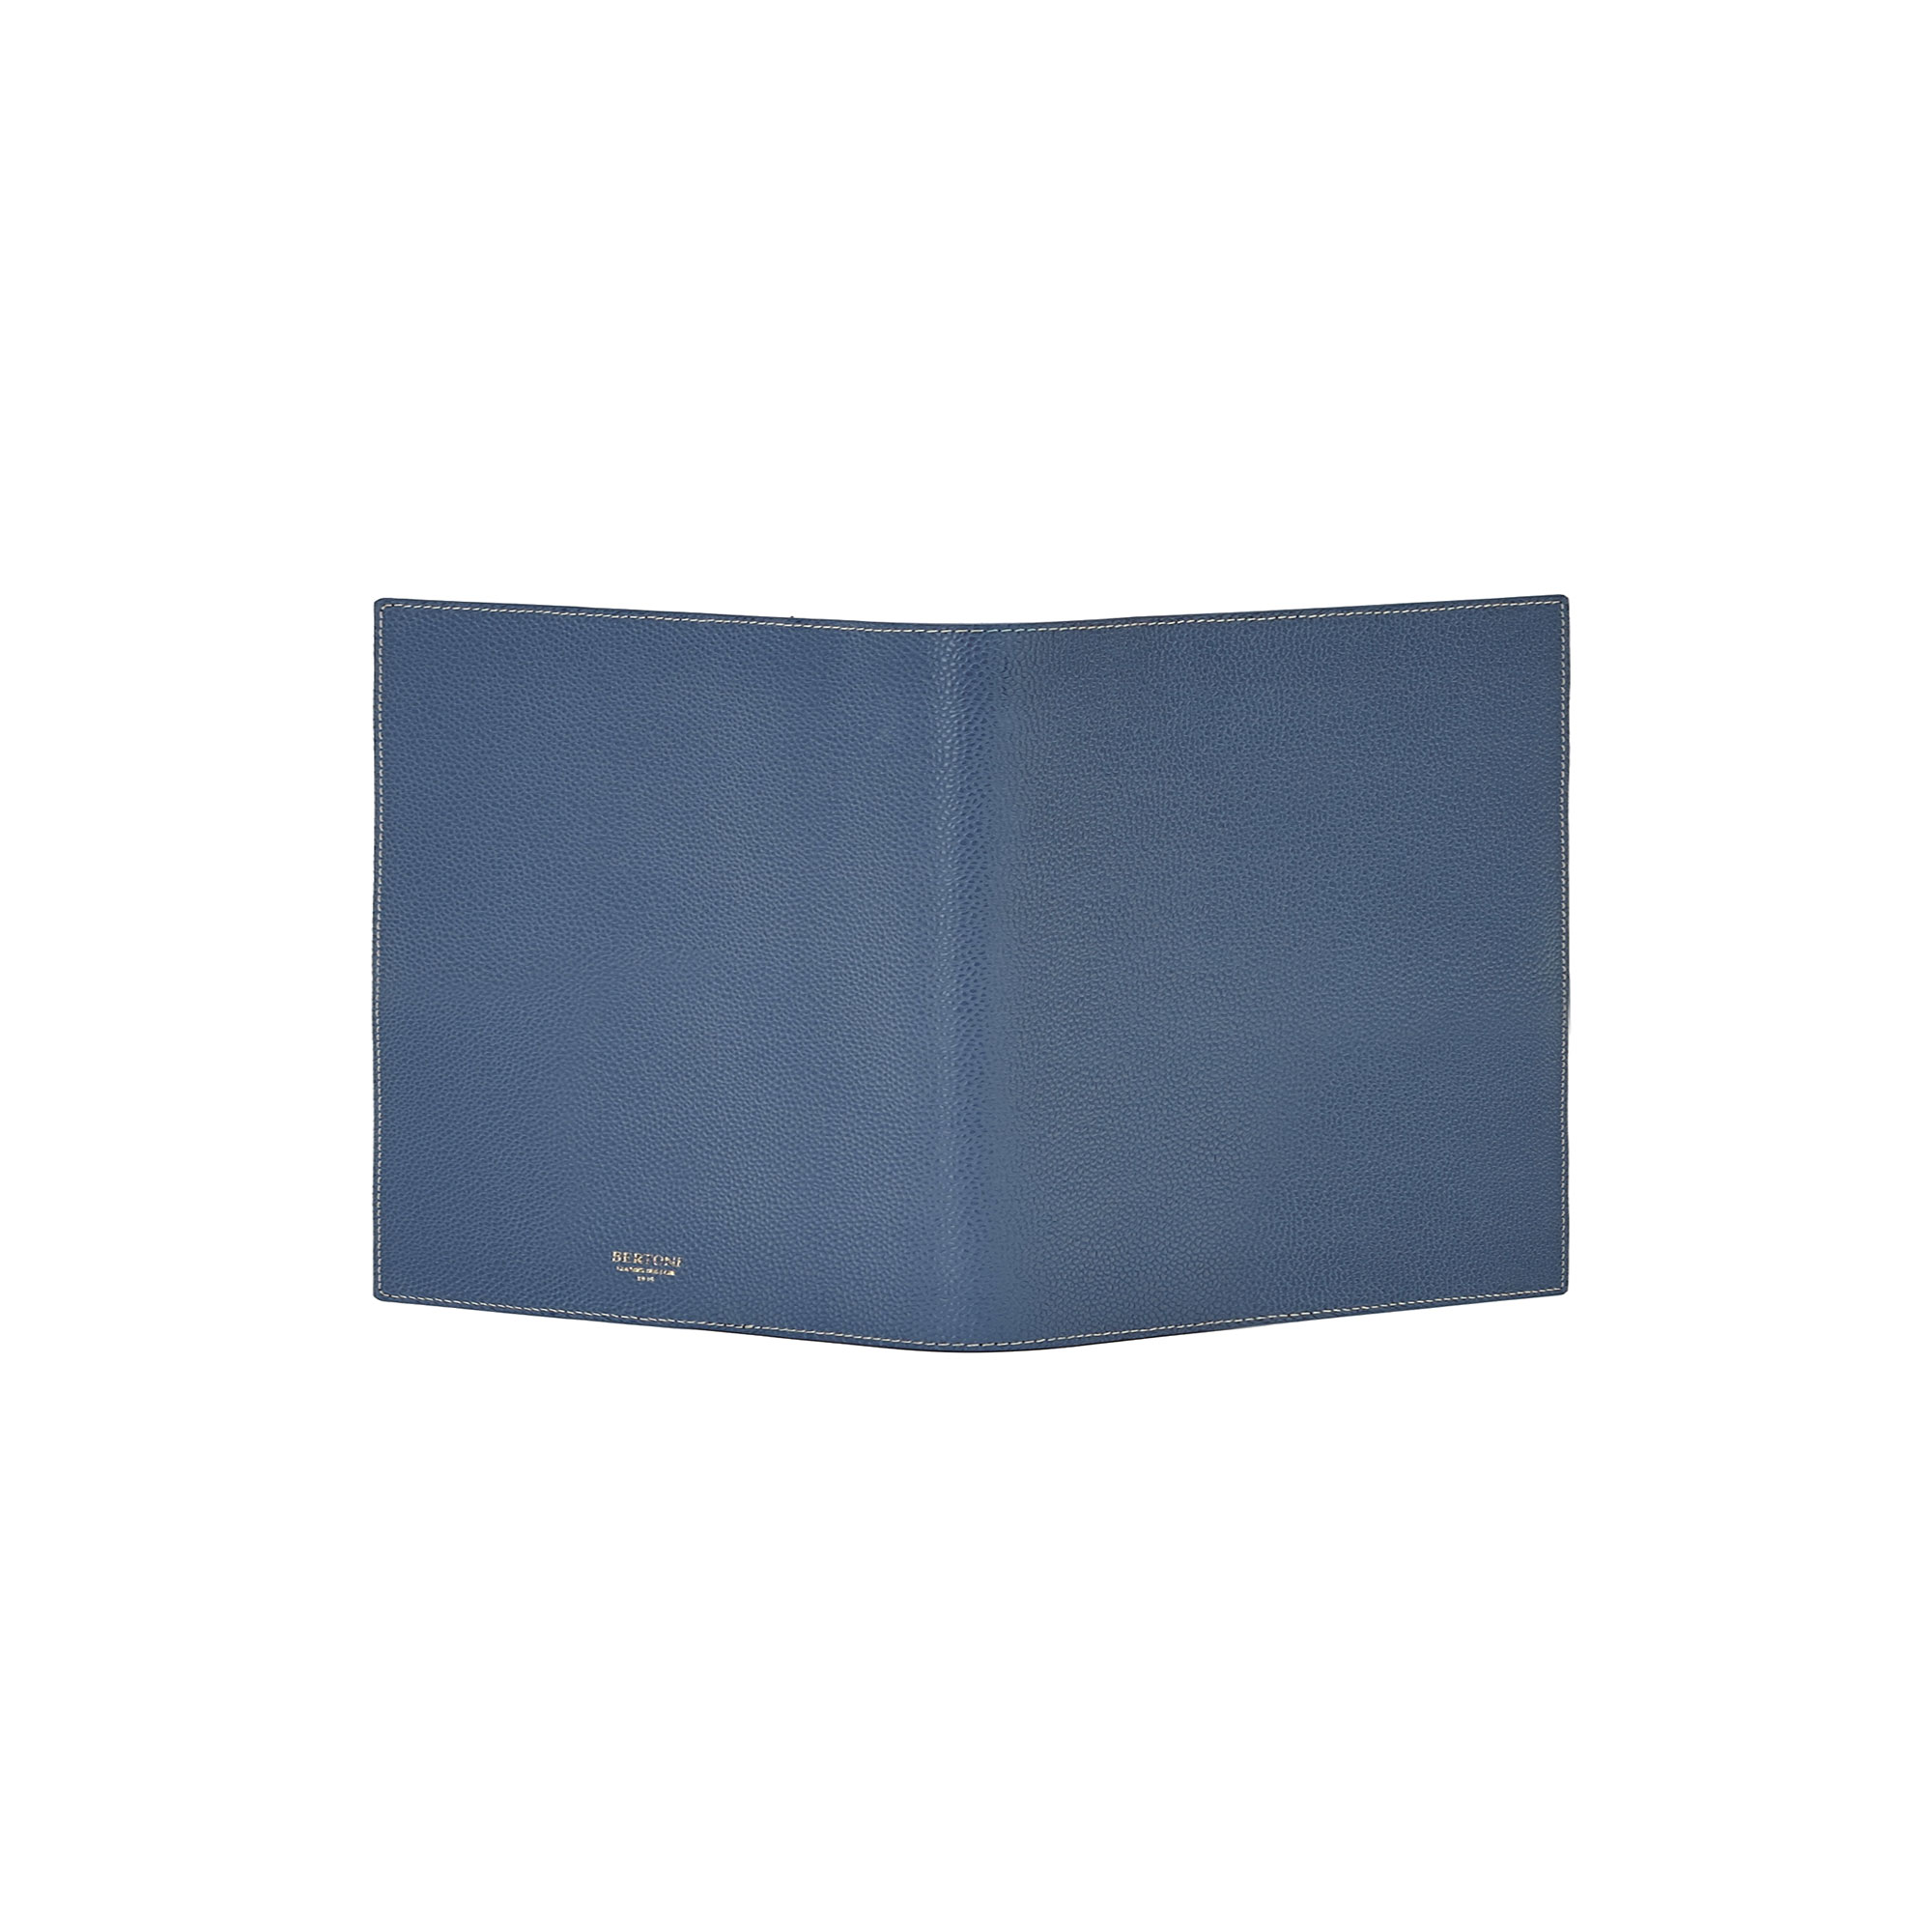 The navy grain calf Diary Holder by Bertoni 1949 02